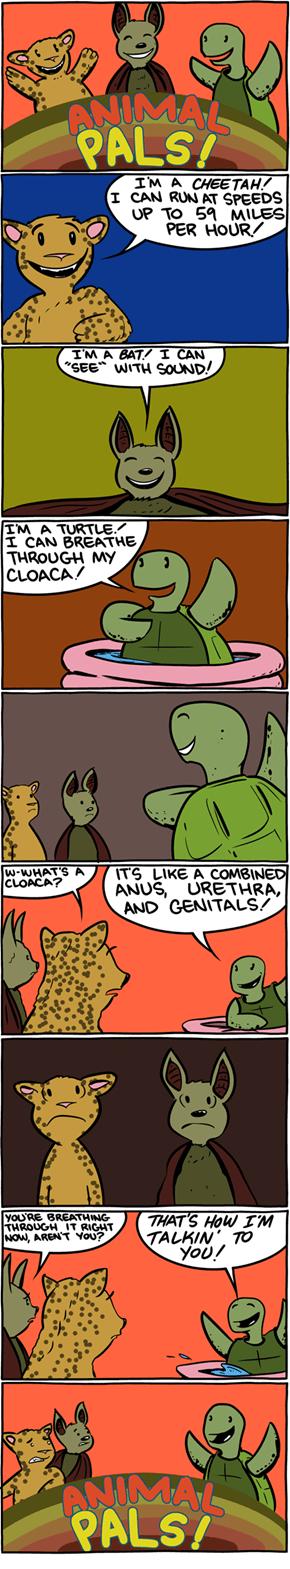 Animal Pals!